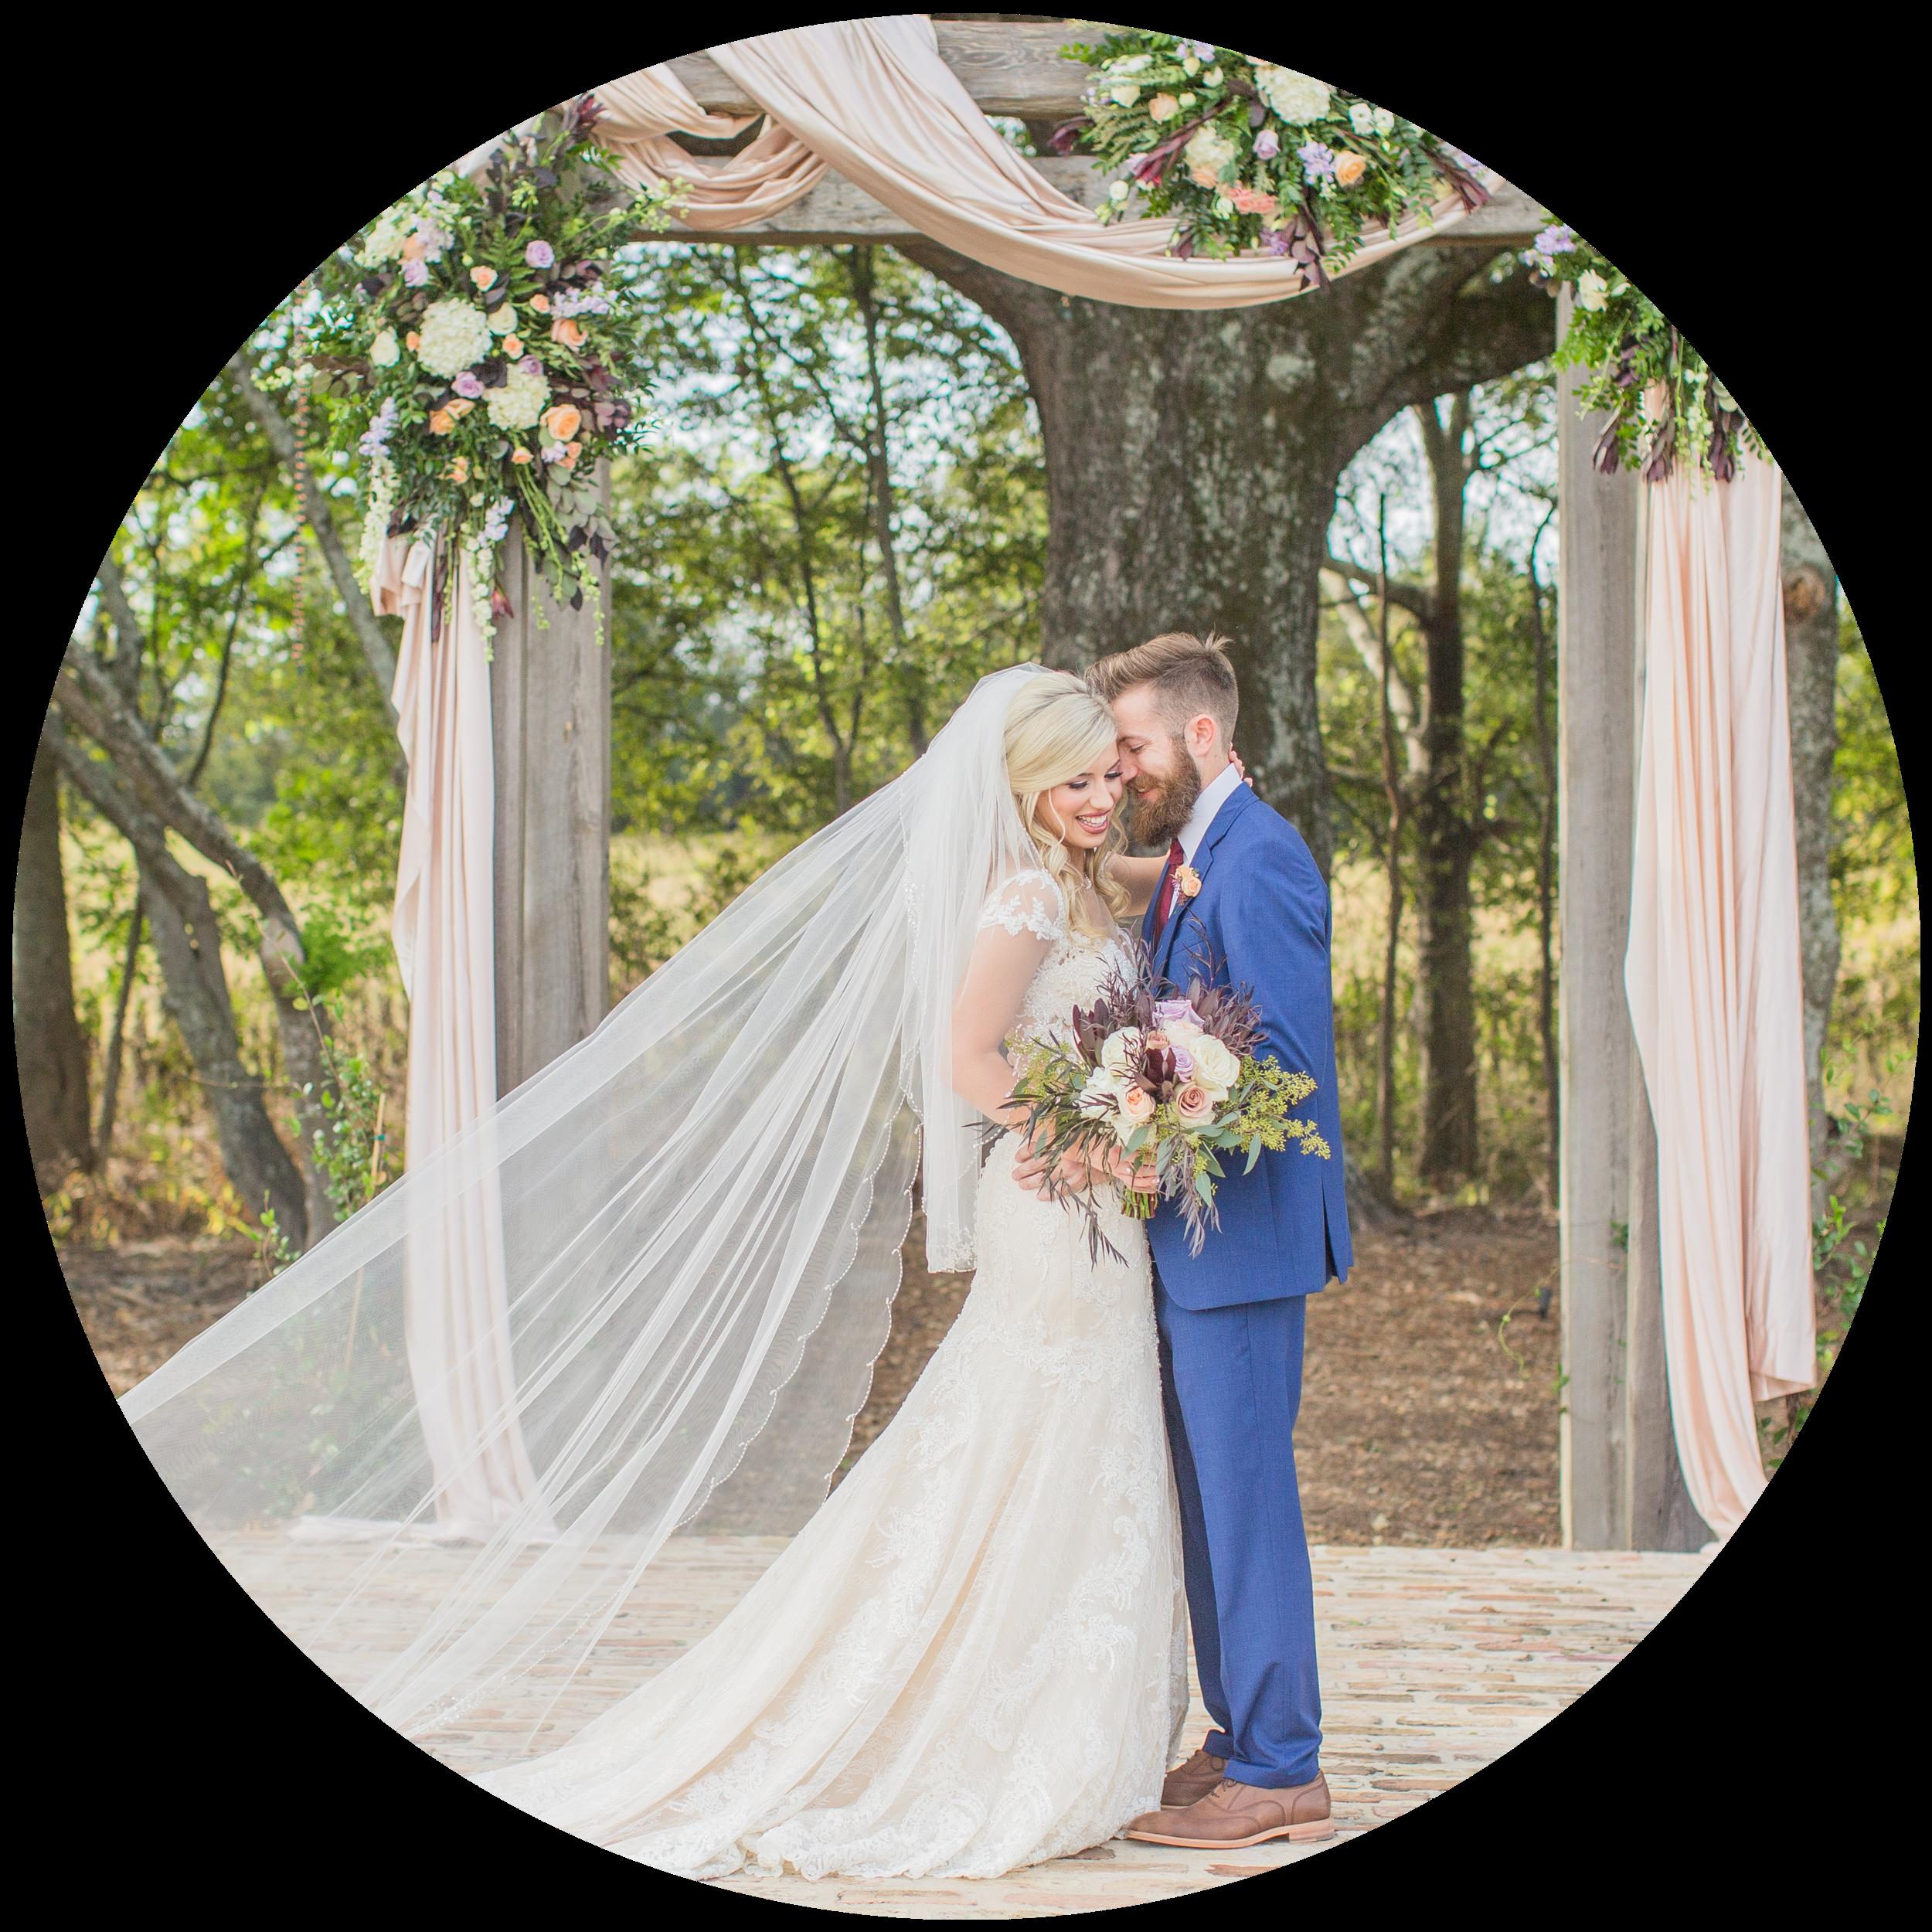 mississippi-wedding-photographer-7.png